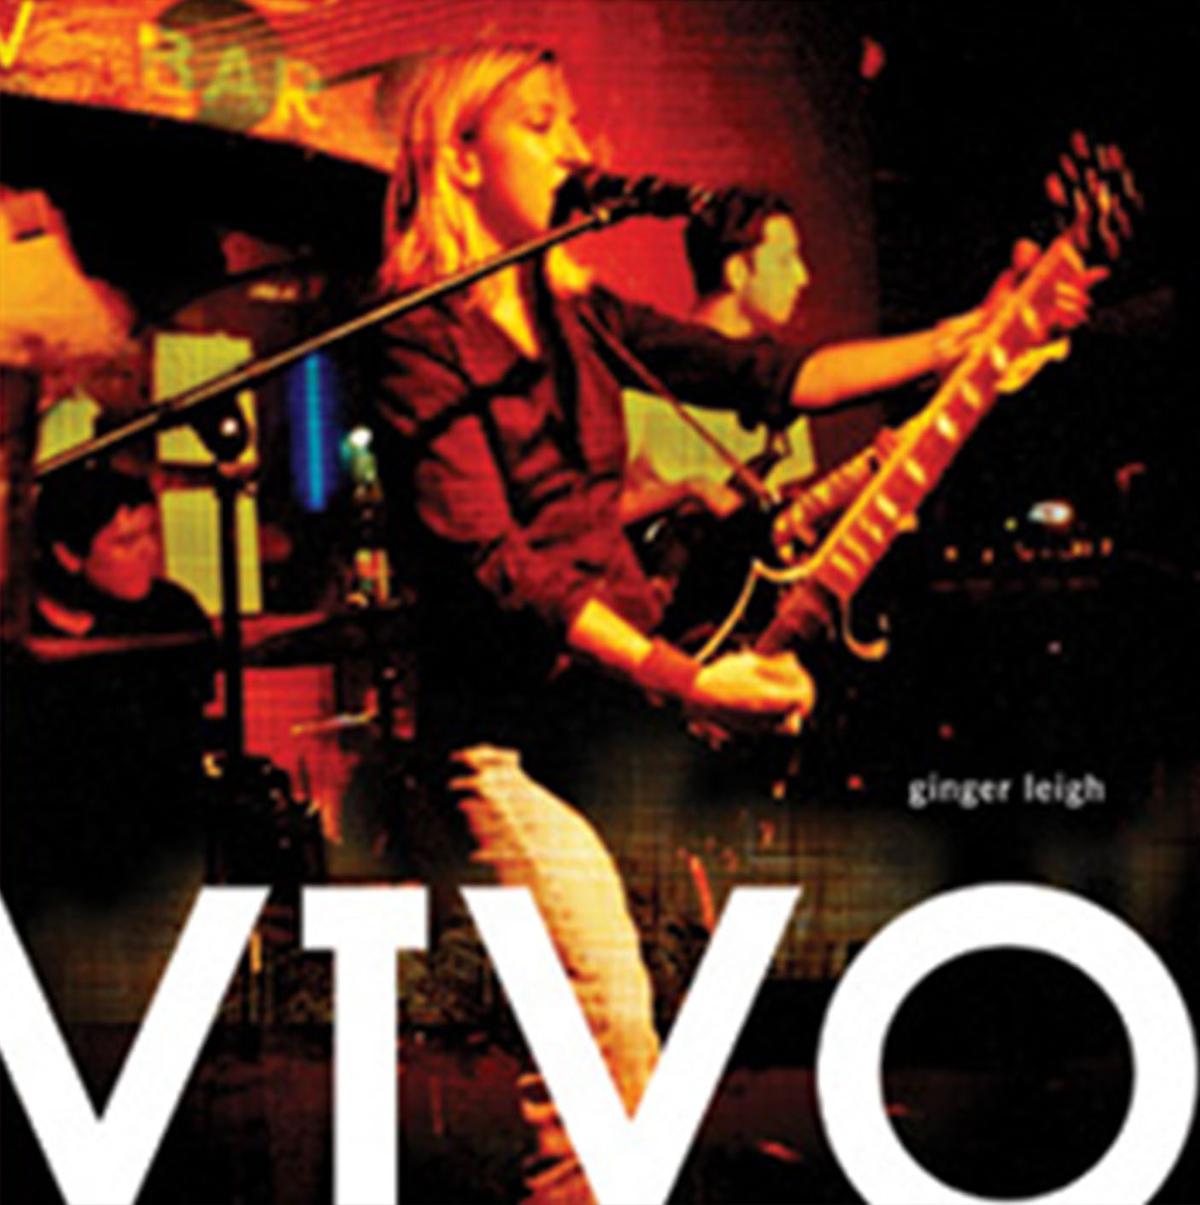 VIVO-Cover.jpg